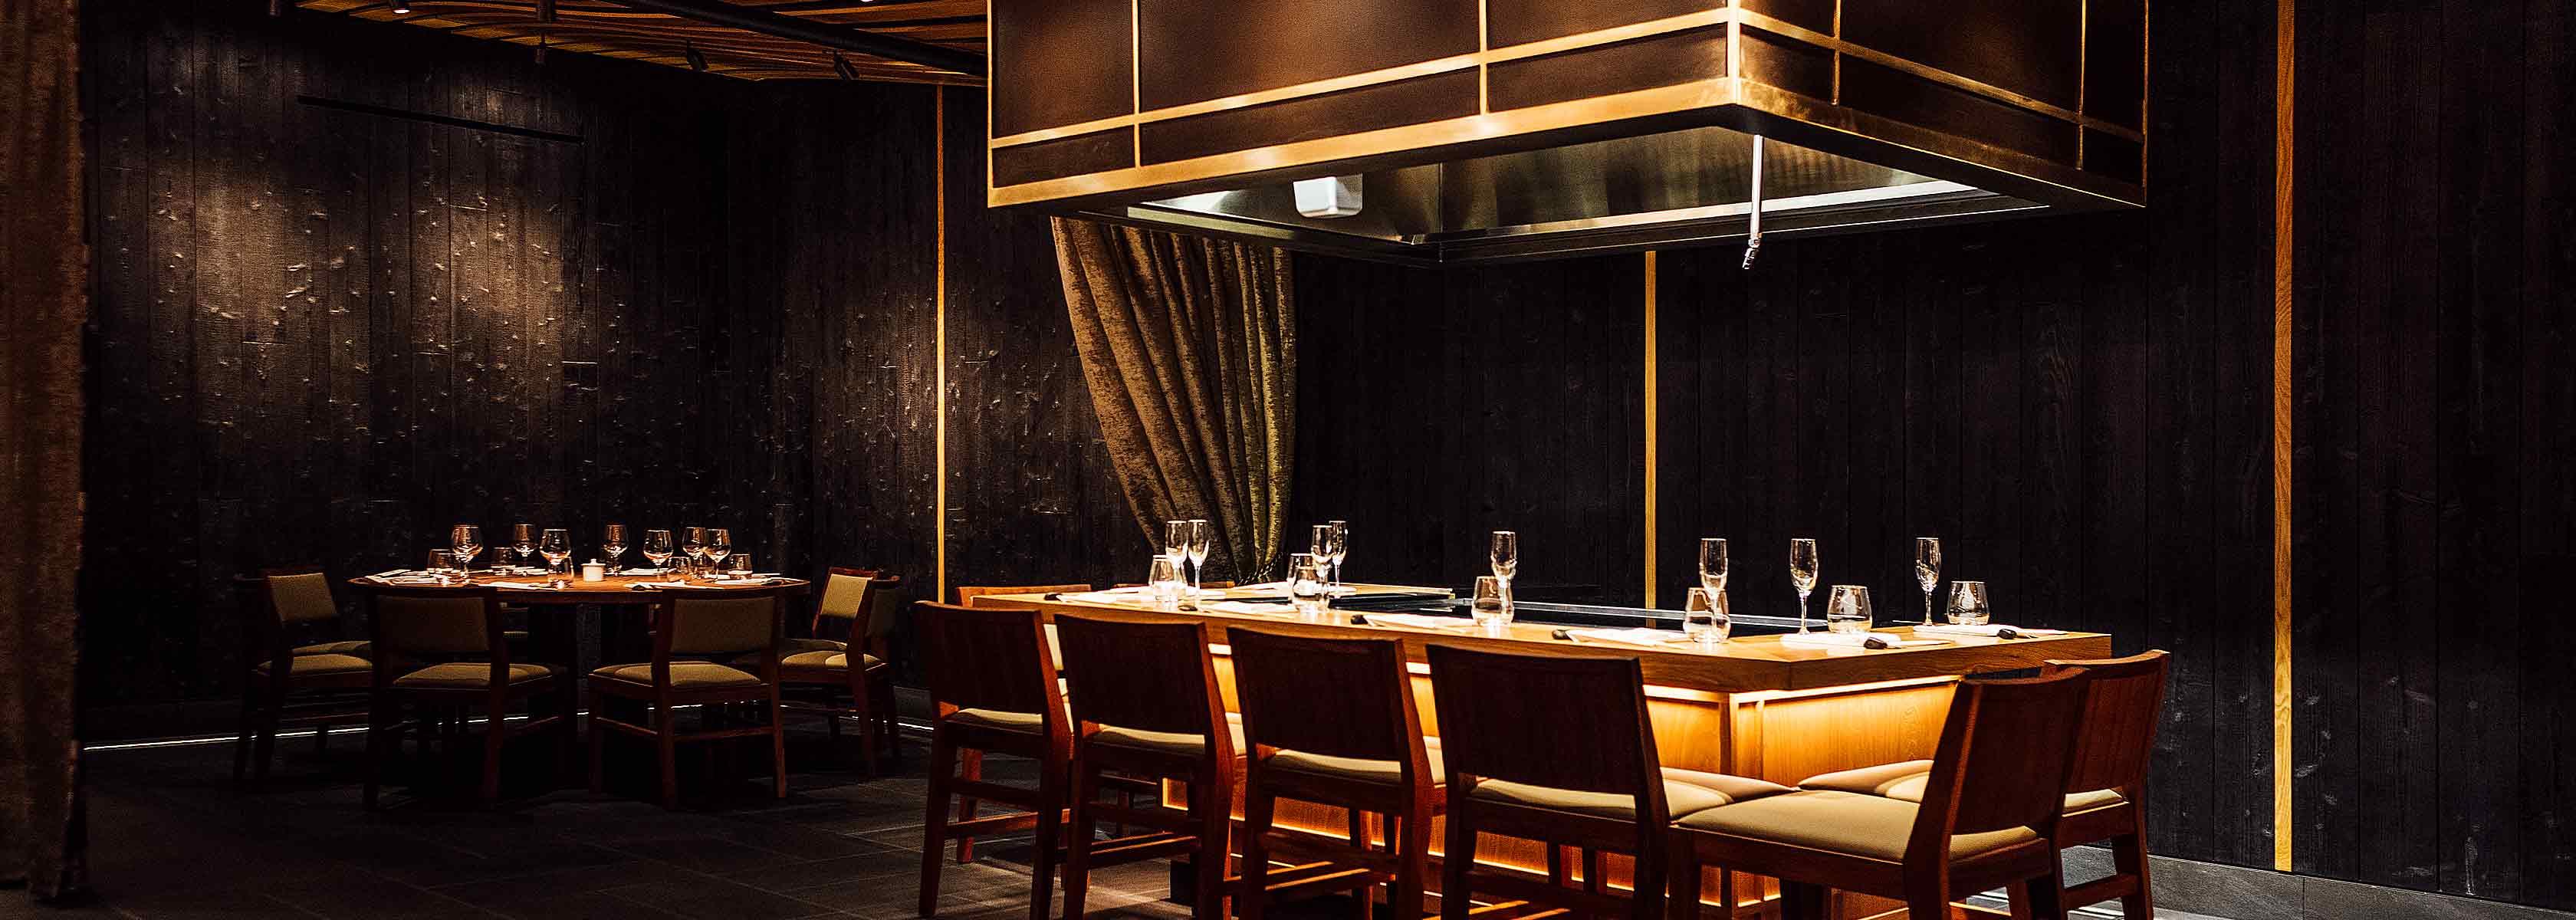 Menus Nobu Restaurants - Teppan table